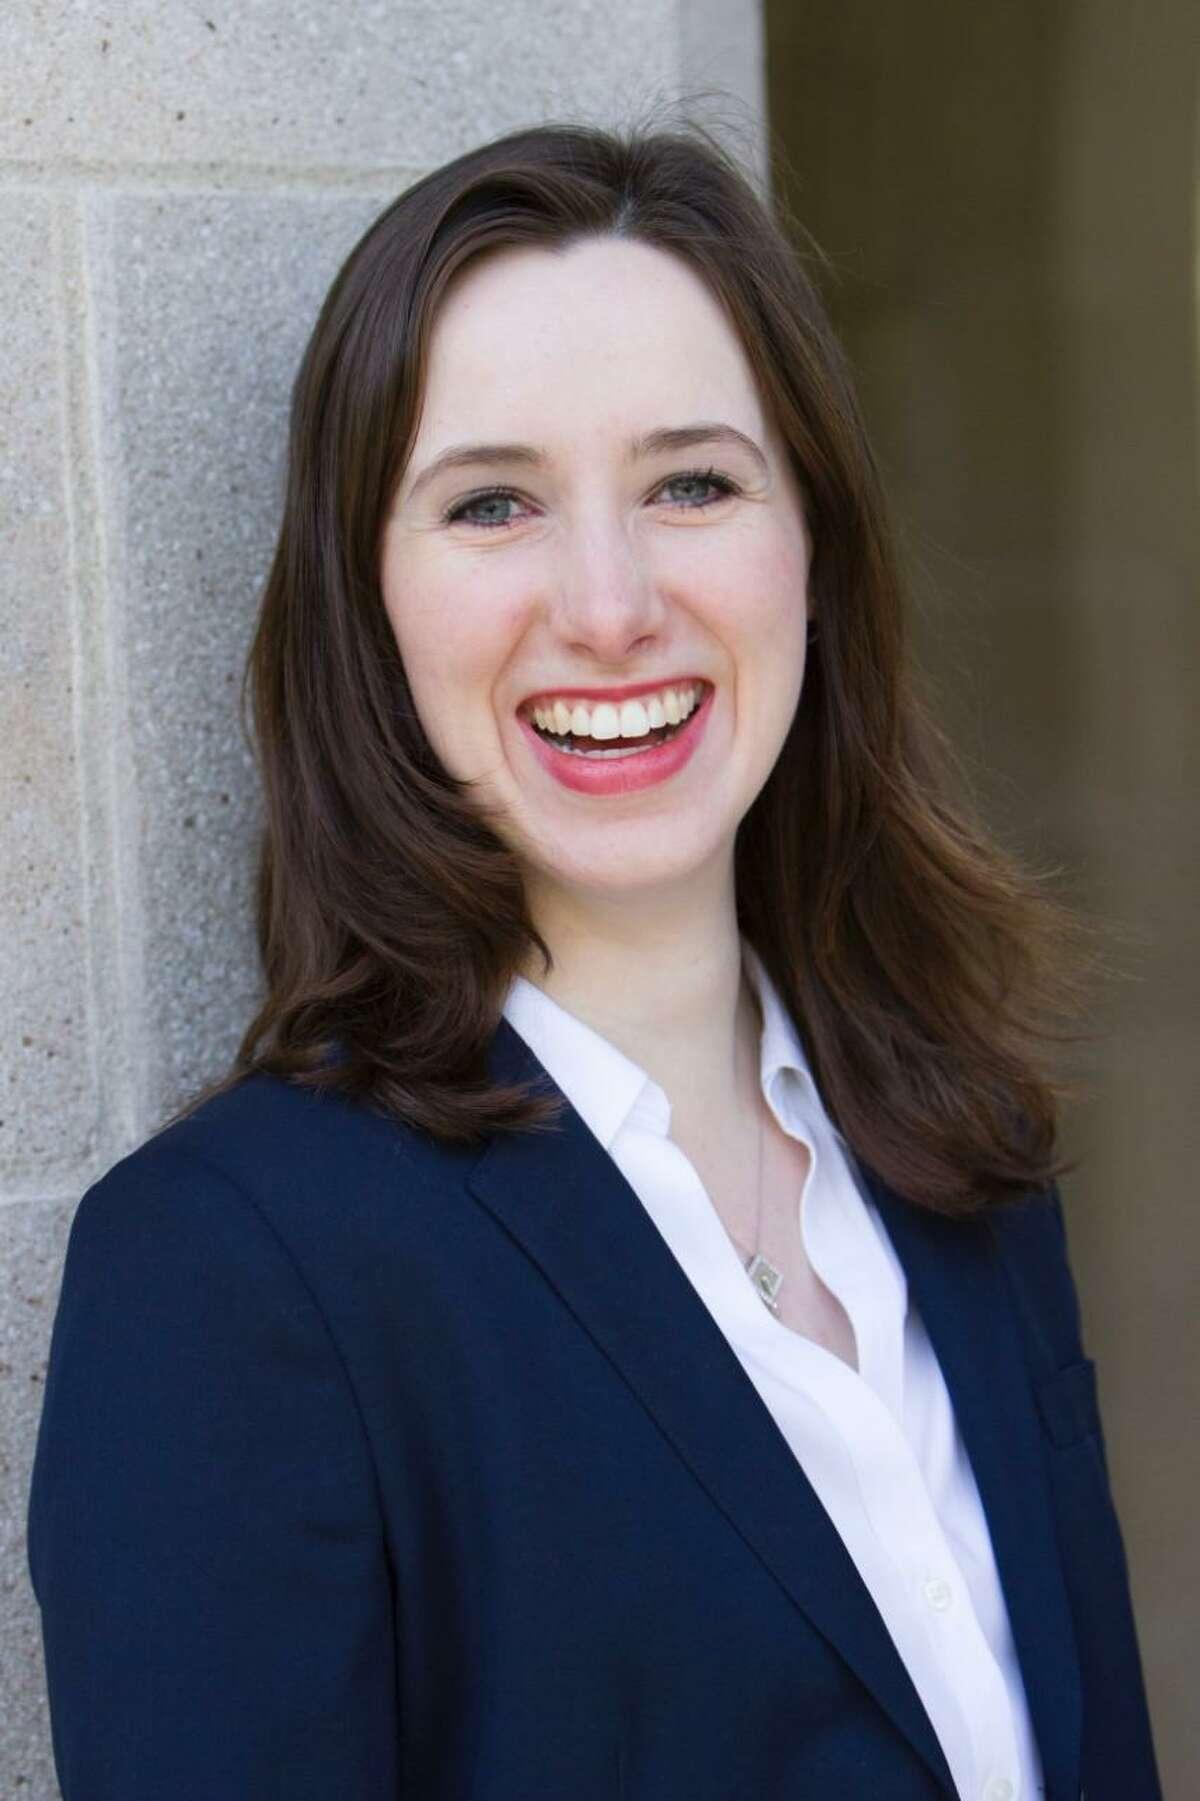 Dentist, Dr. Ashley Pacelli, has joined Fairfield Chamber of Commerce member DeMartin Dental Associates dental practice.